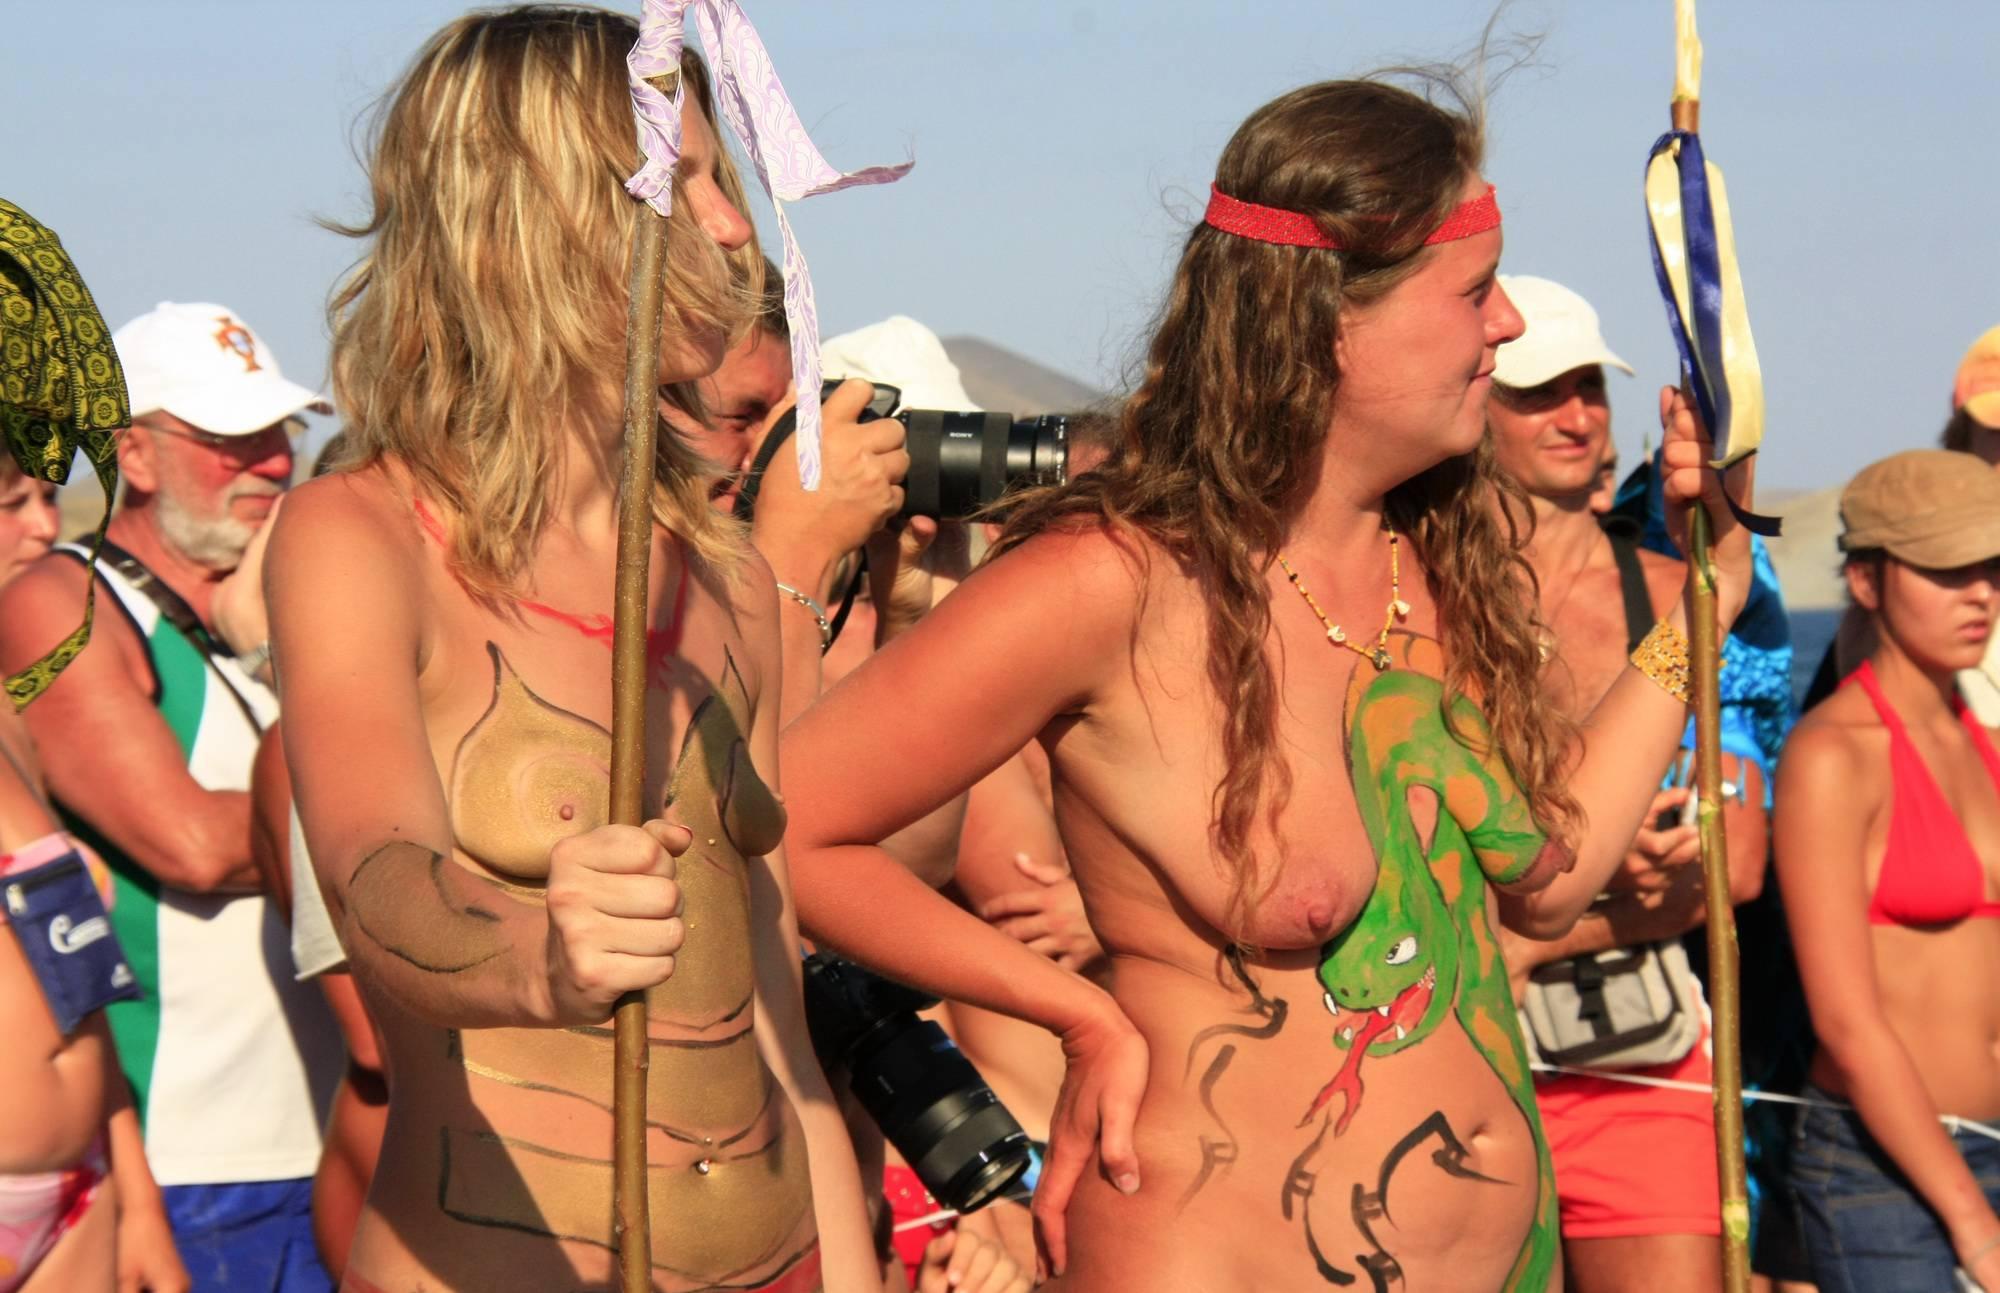 Nude Group Beach Profile - 1